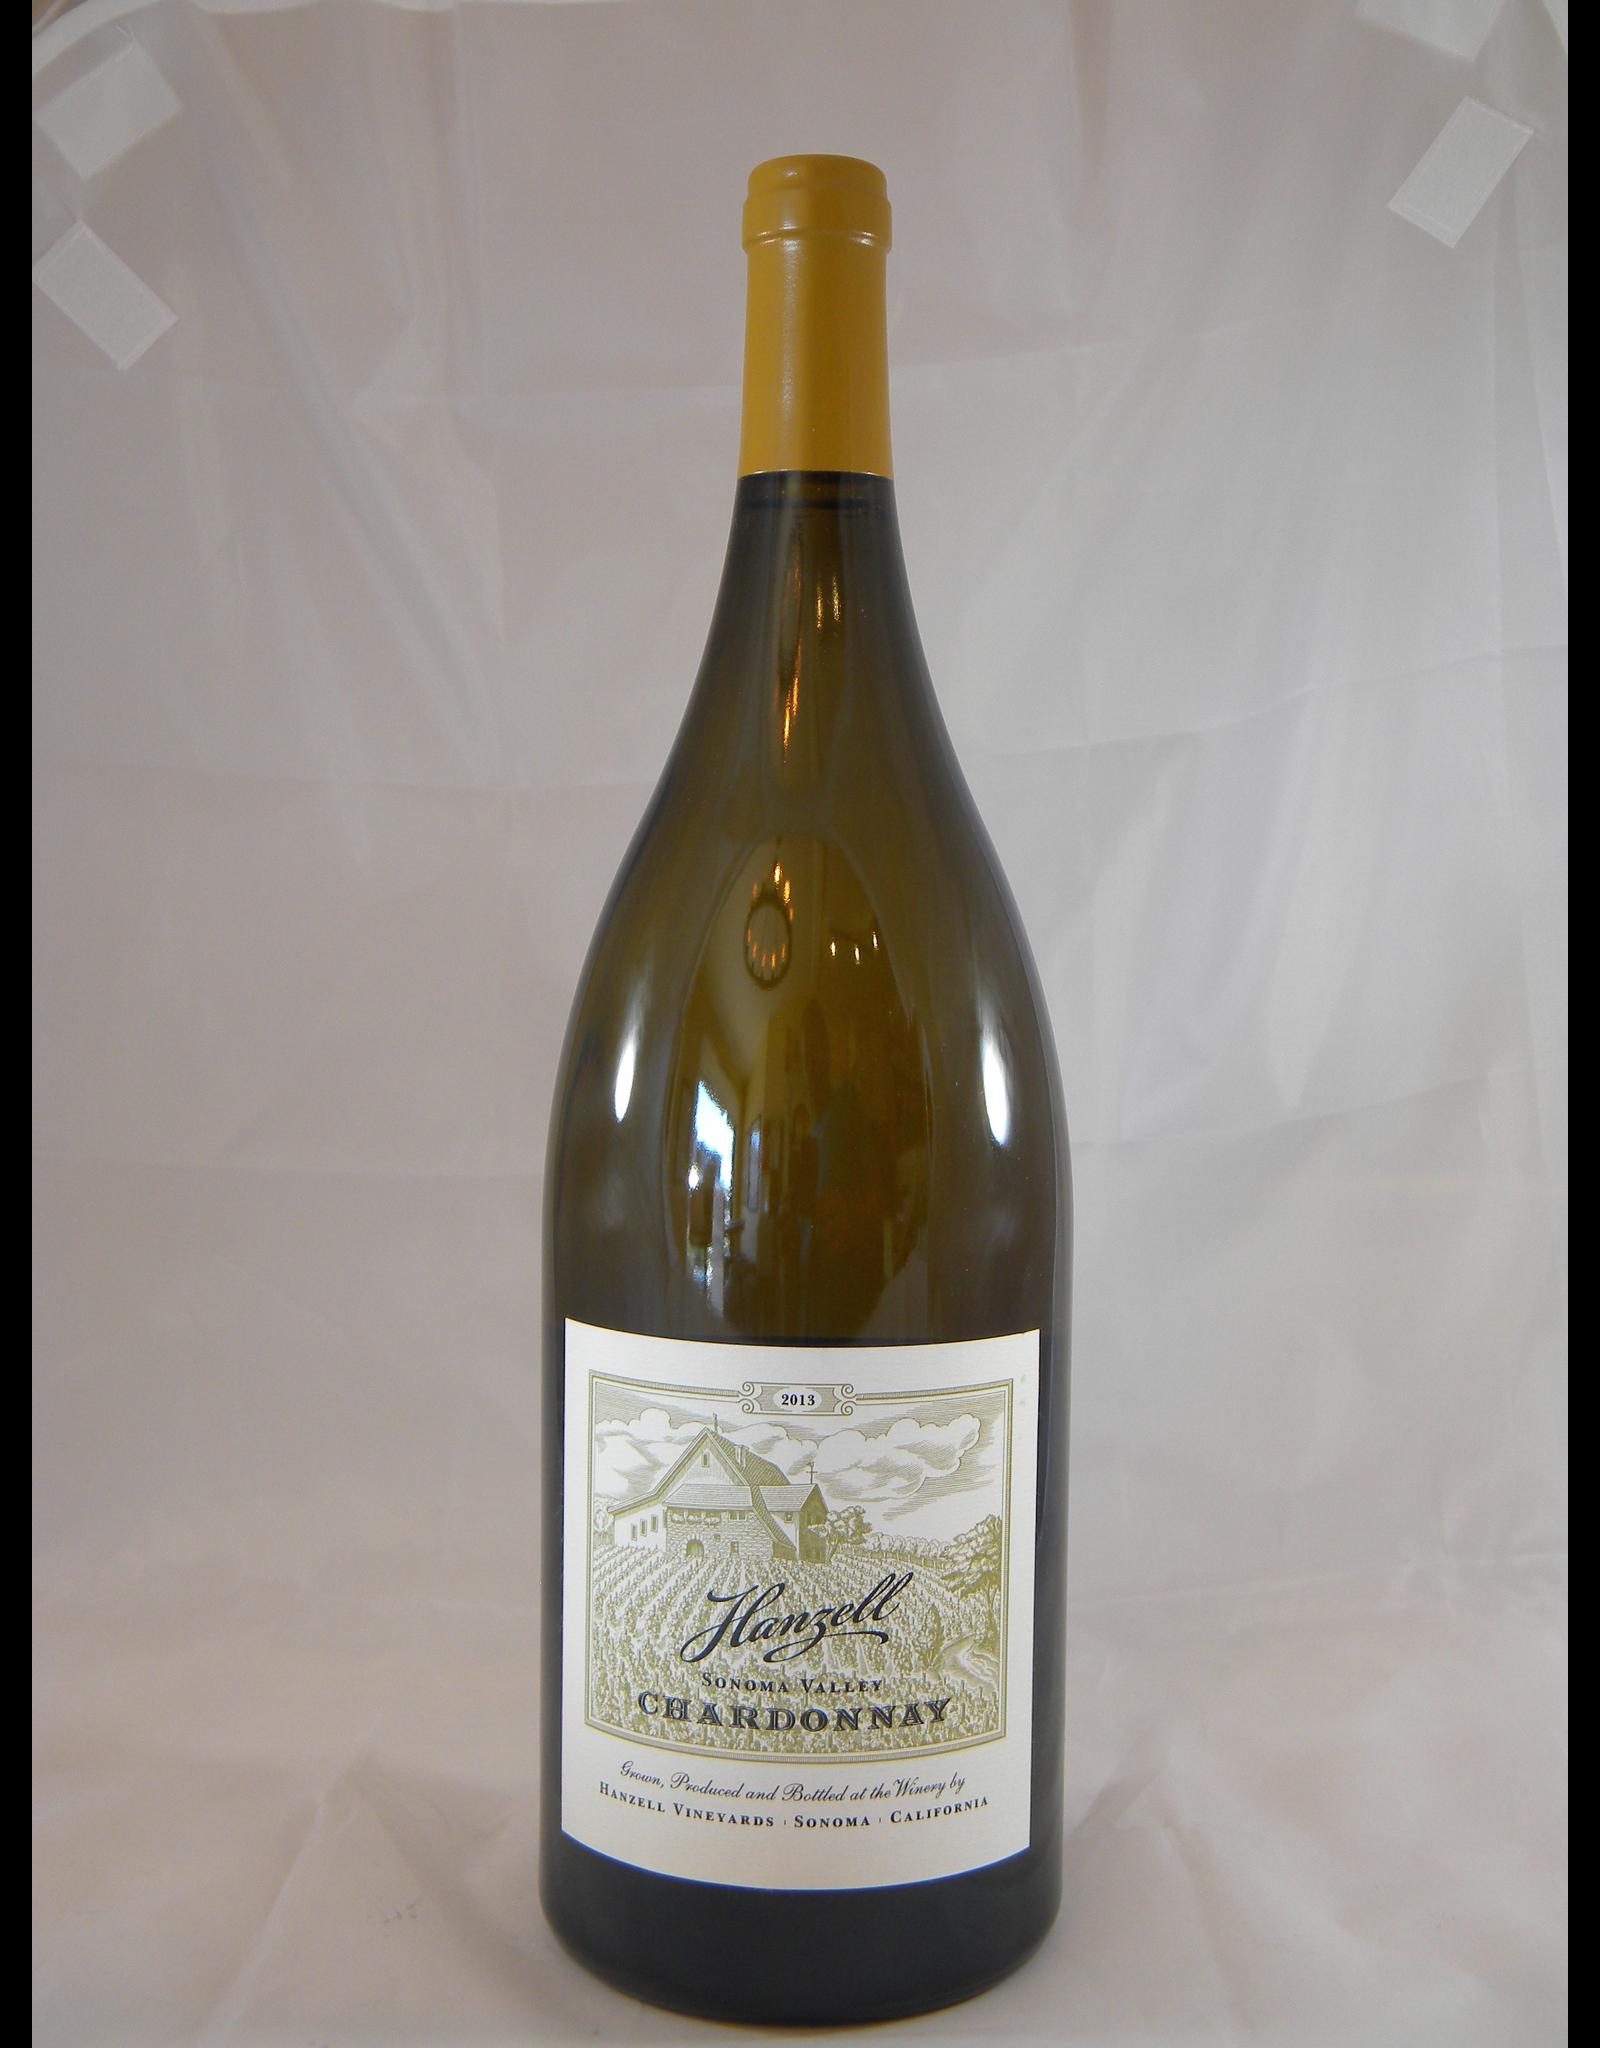 Hanzell Hanzell Chardonnay Sonoma Magnum 2013